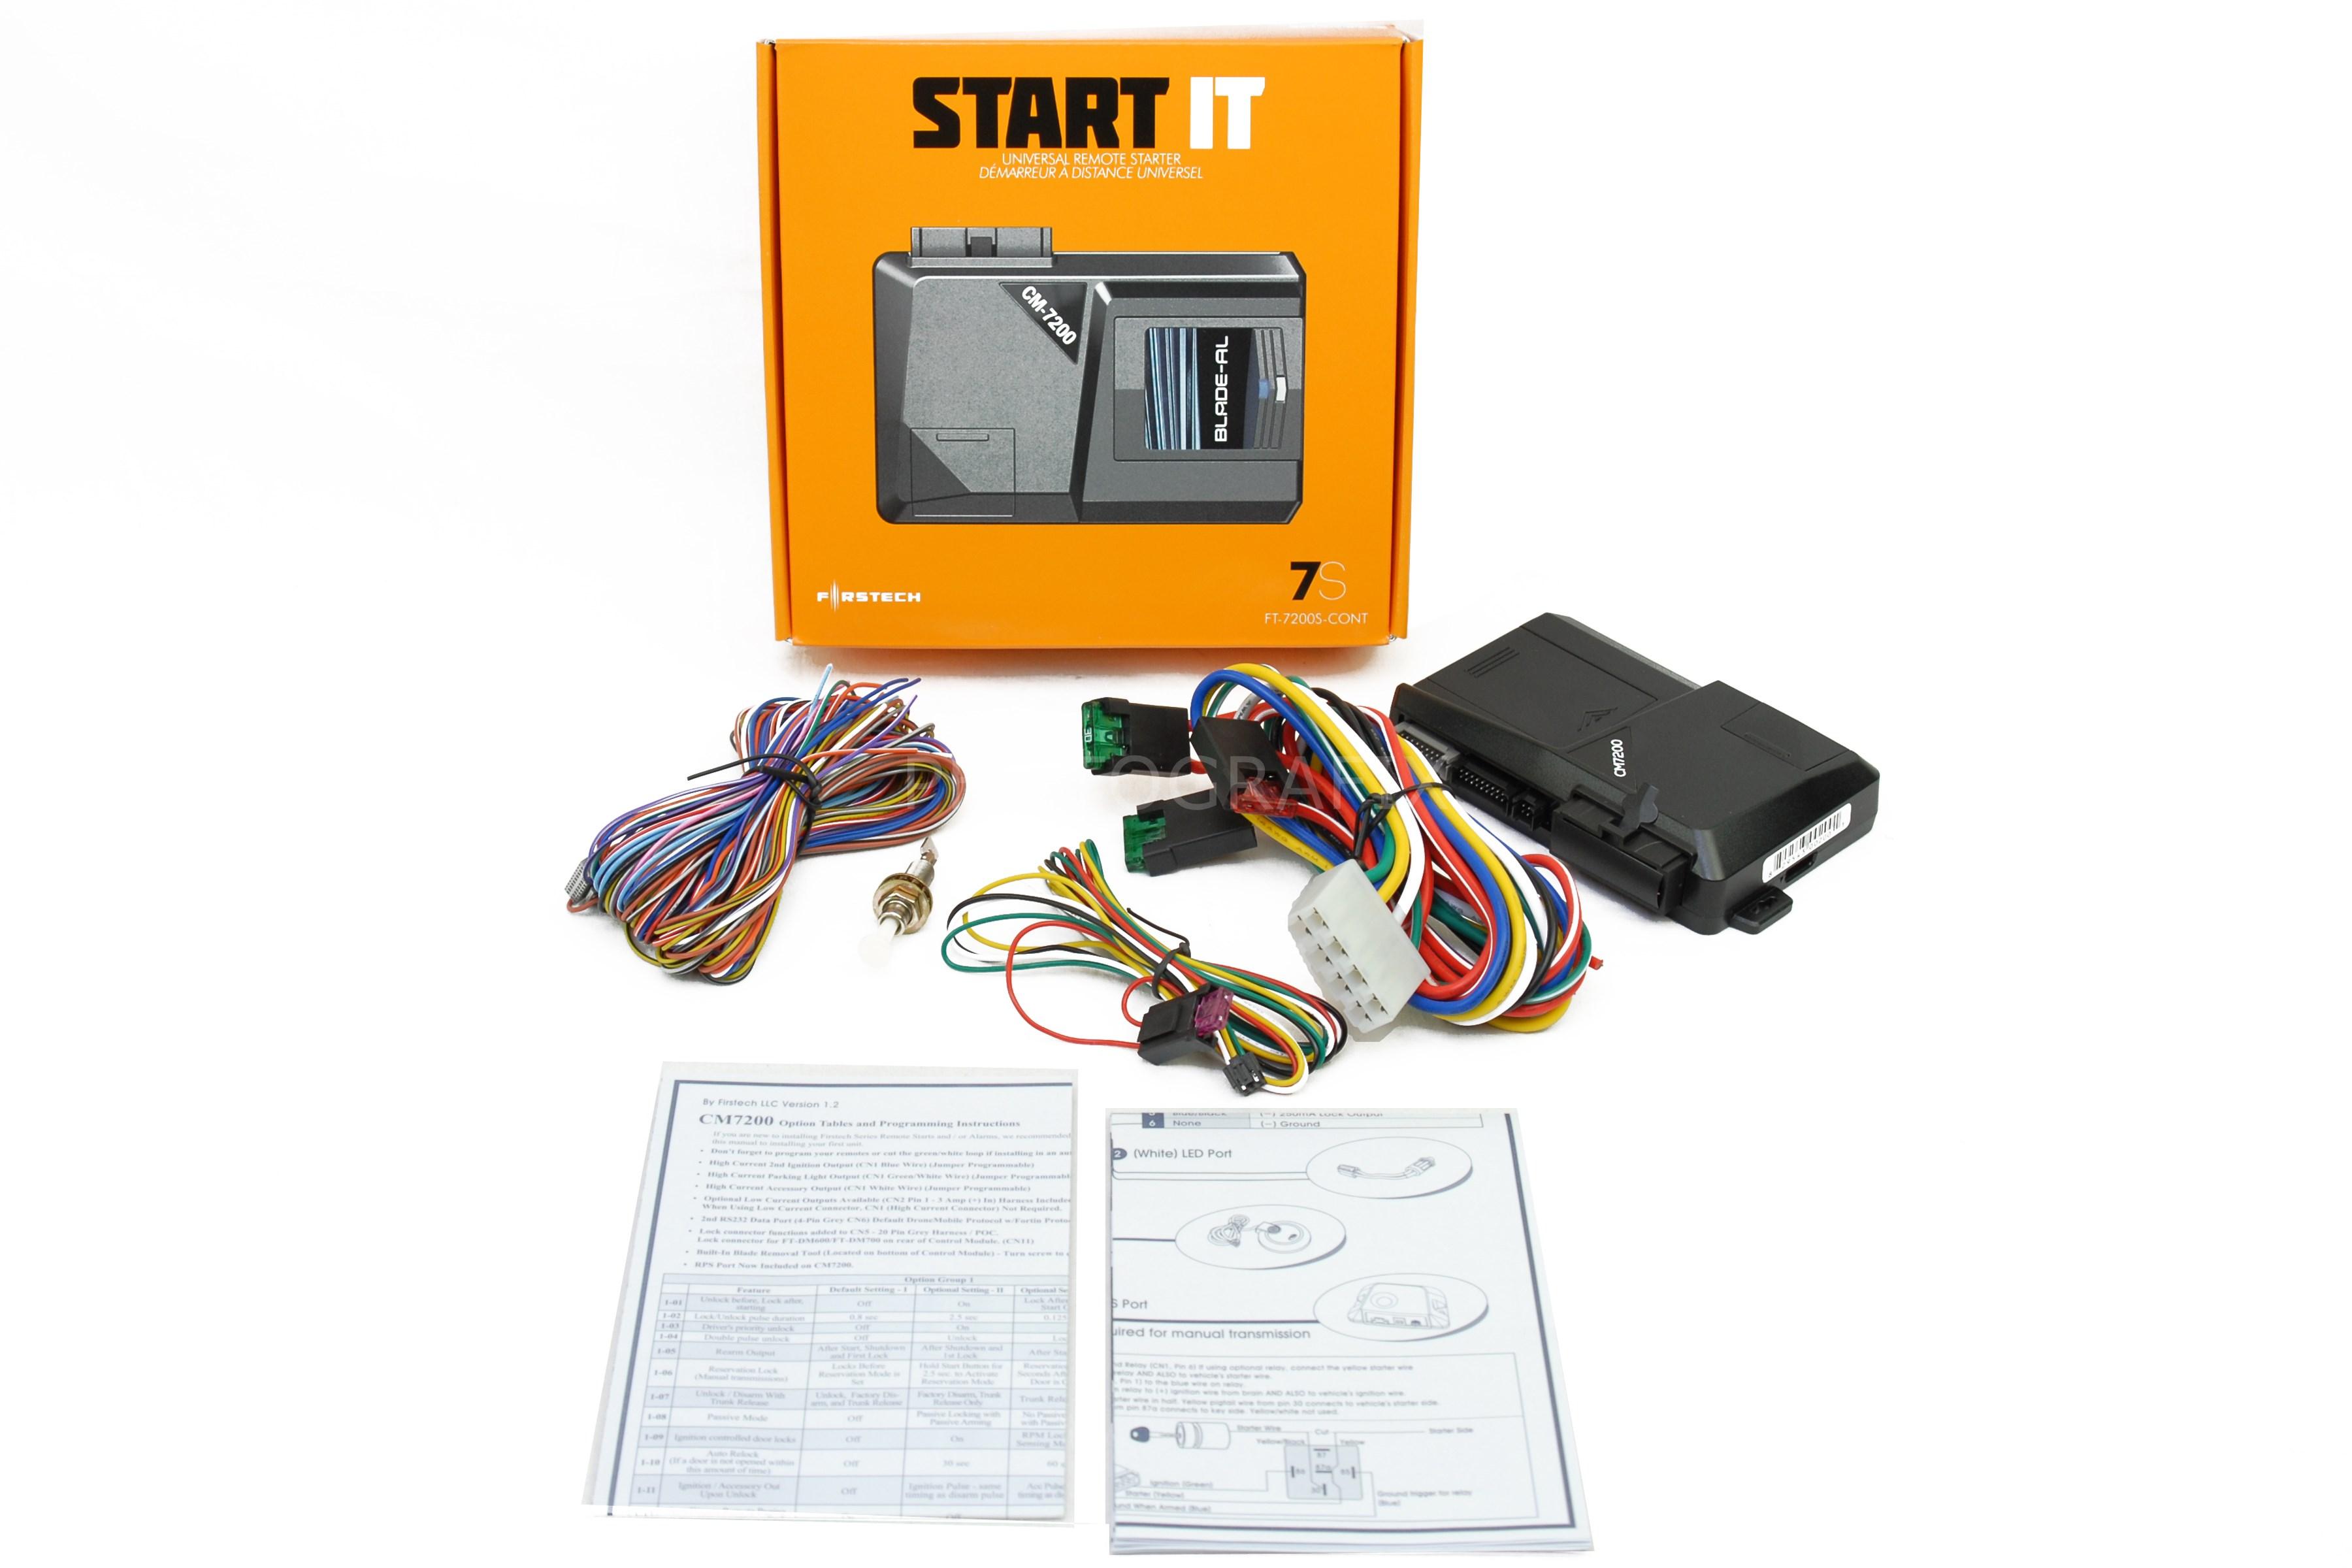 compustar ft7200s remote keyless remote start control ft 7200s cont rh ebay com compustar manuals cm3000 compustar manual transmission guide